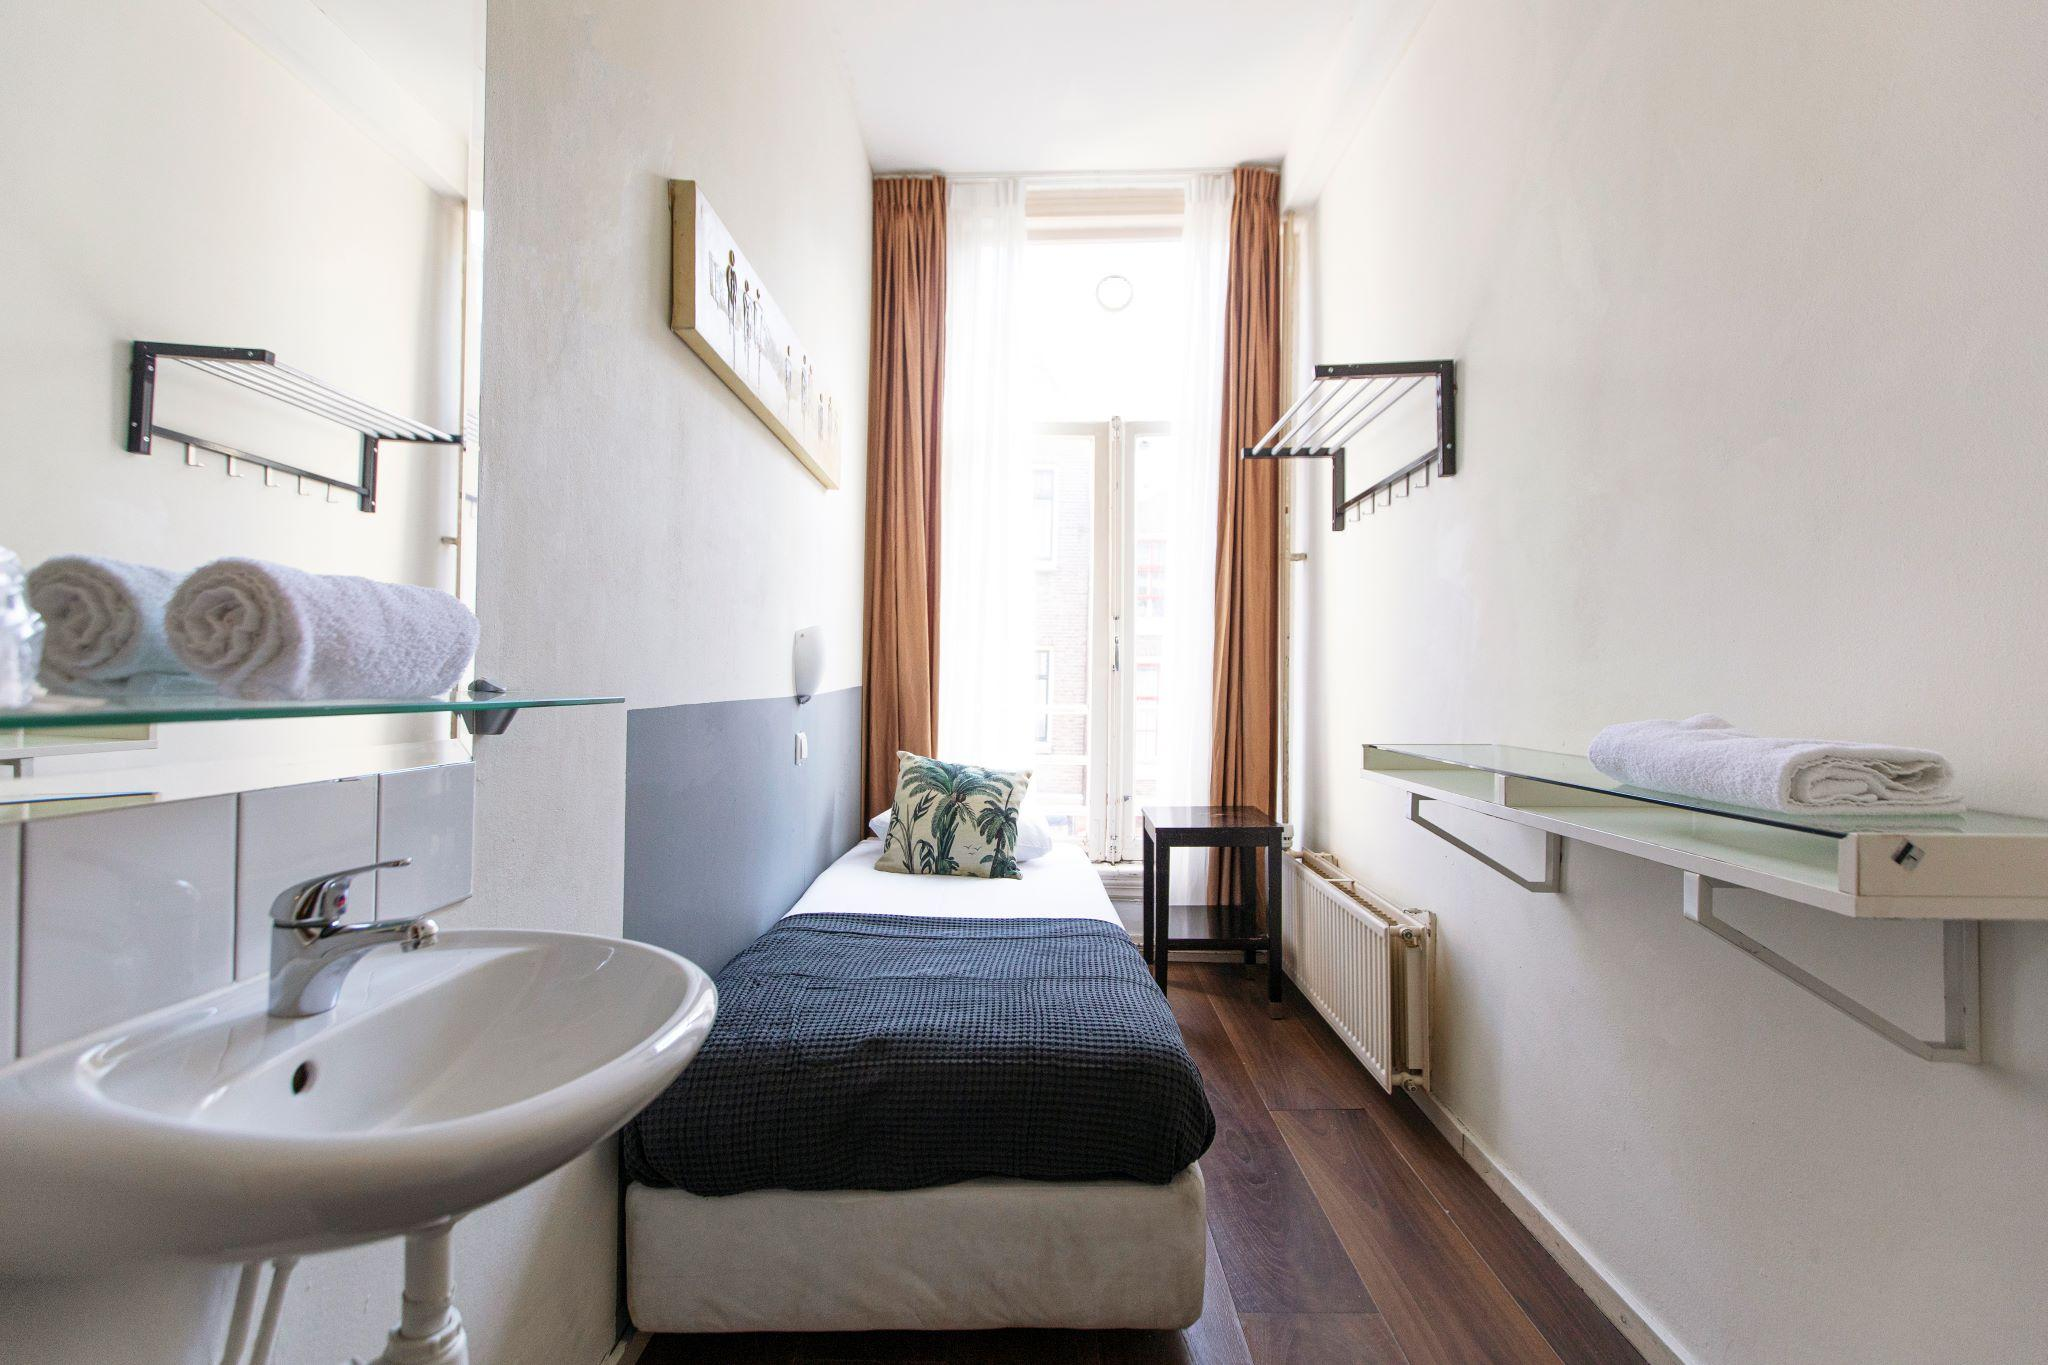 Single economy with shared bathroom